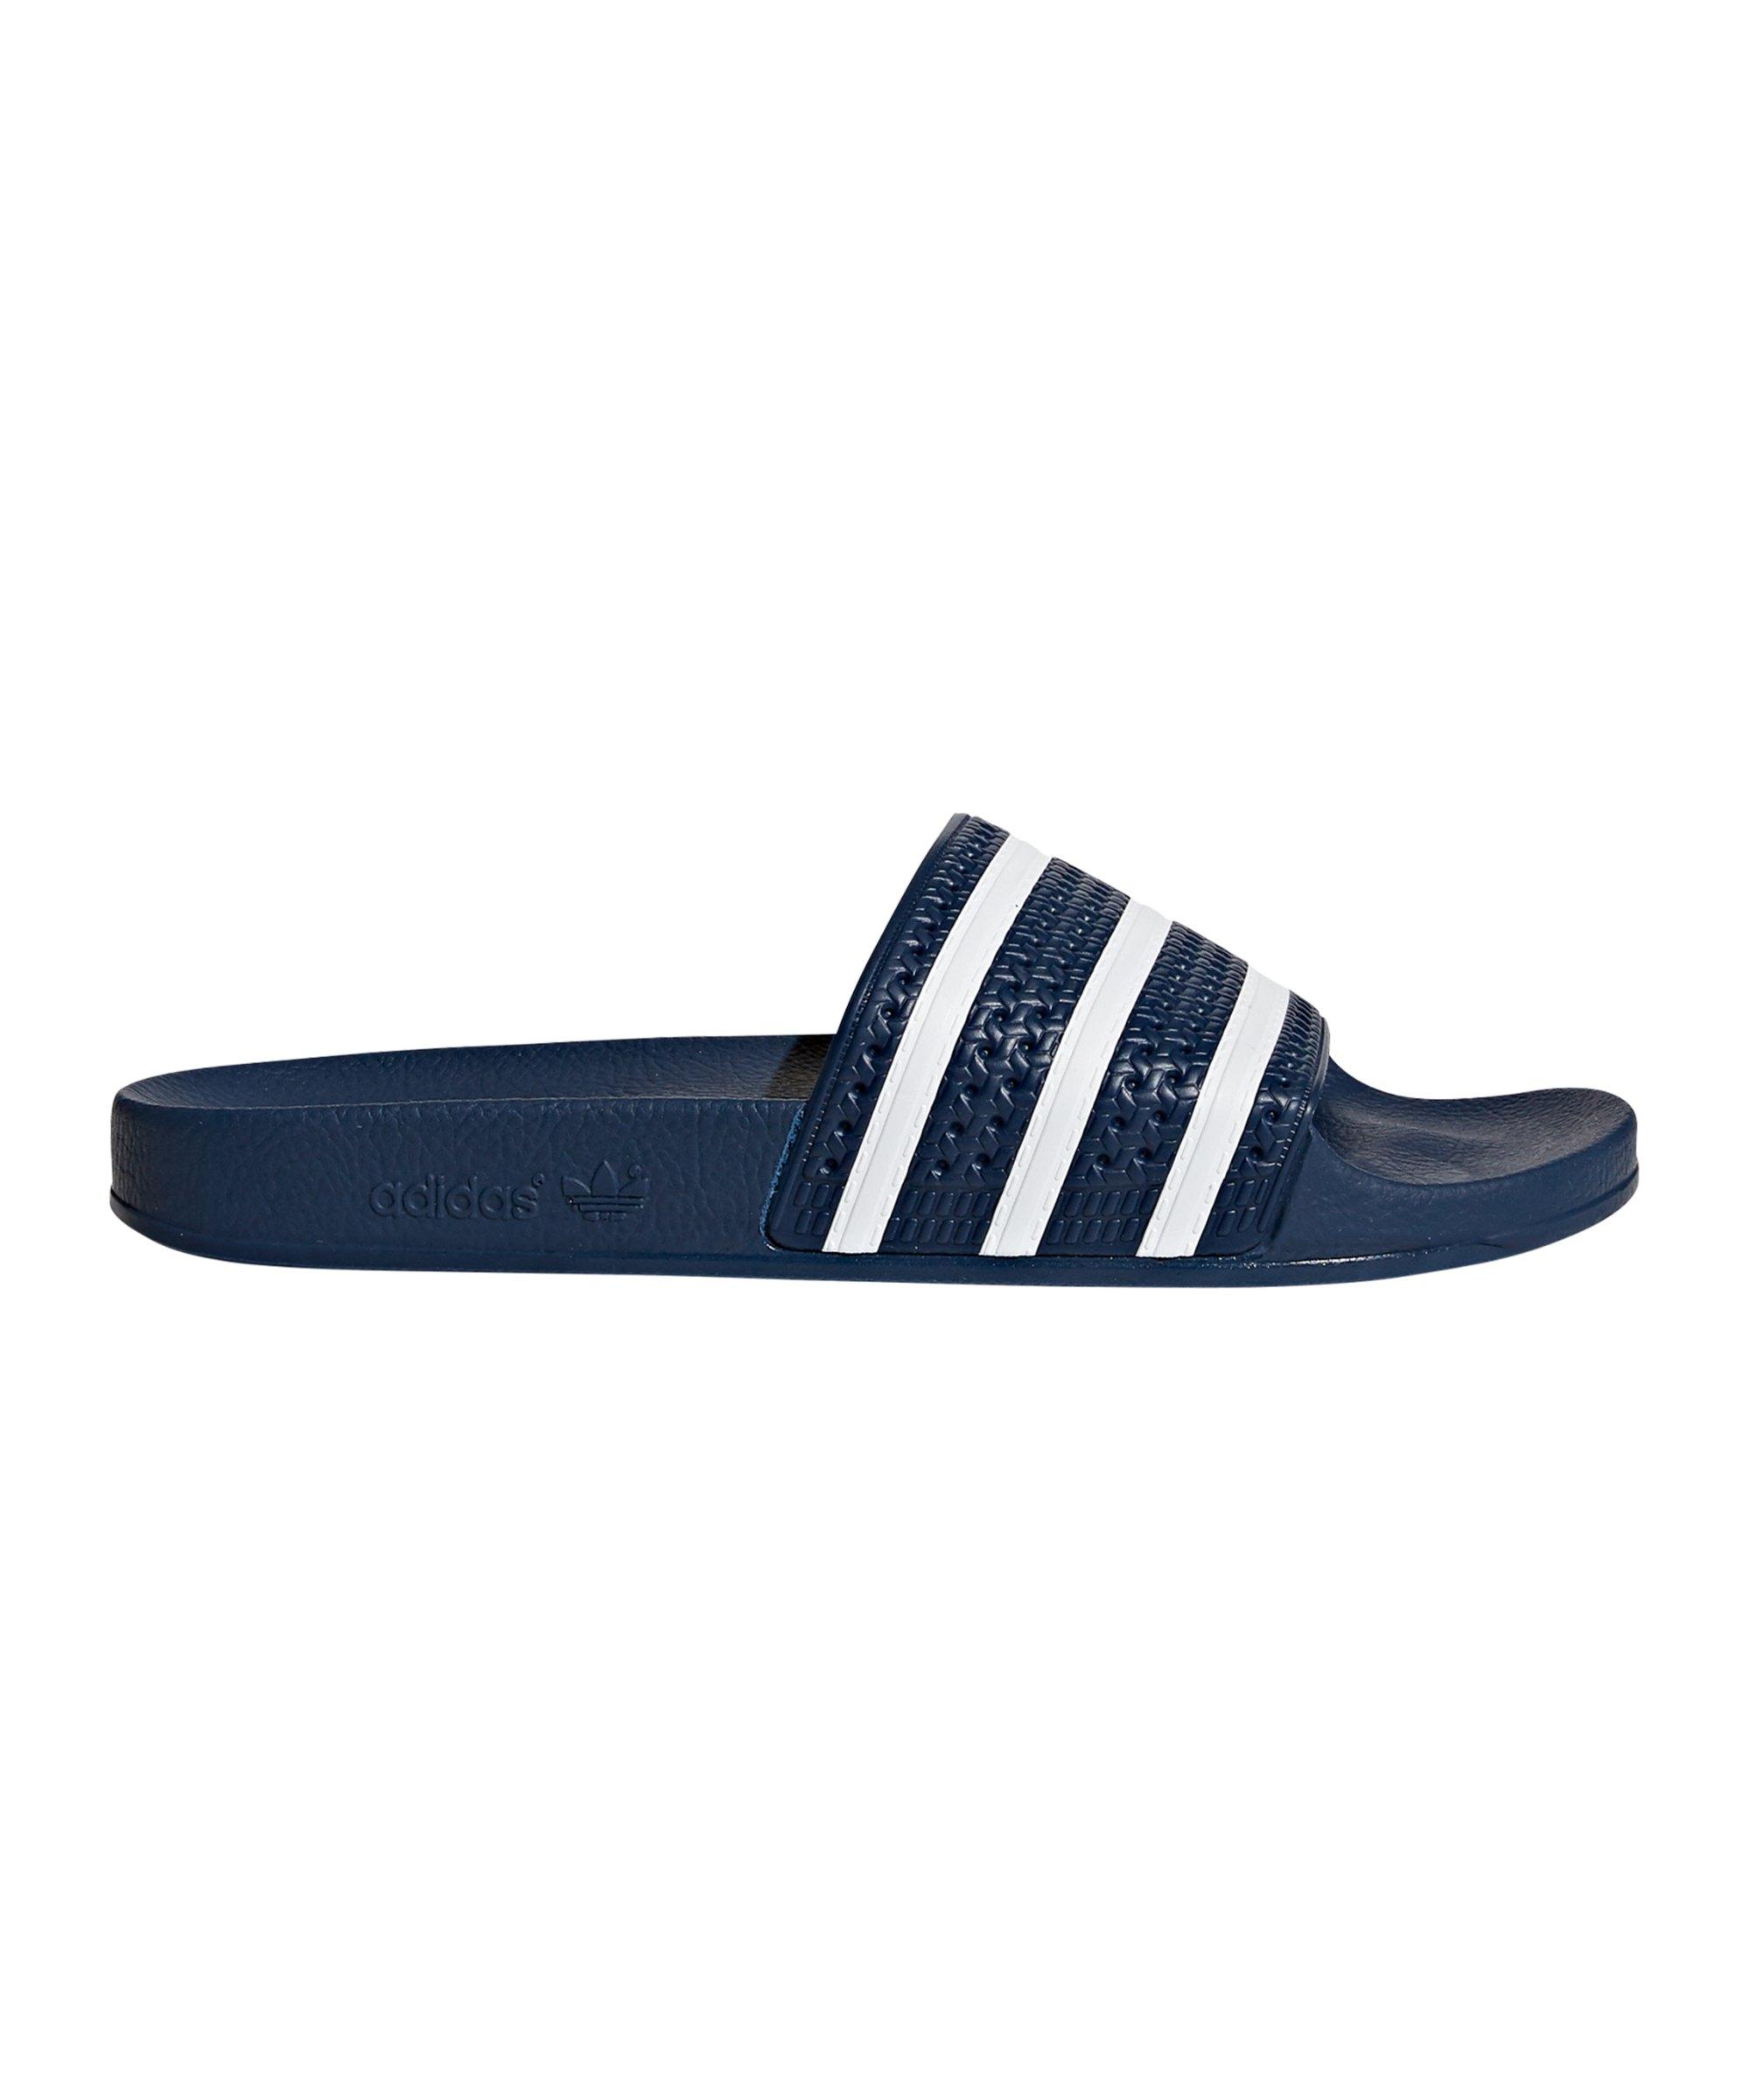 adidas badelatschen adilette blau